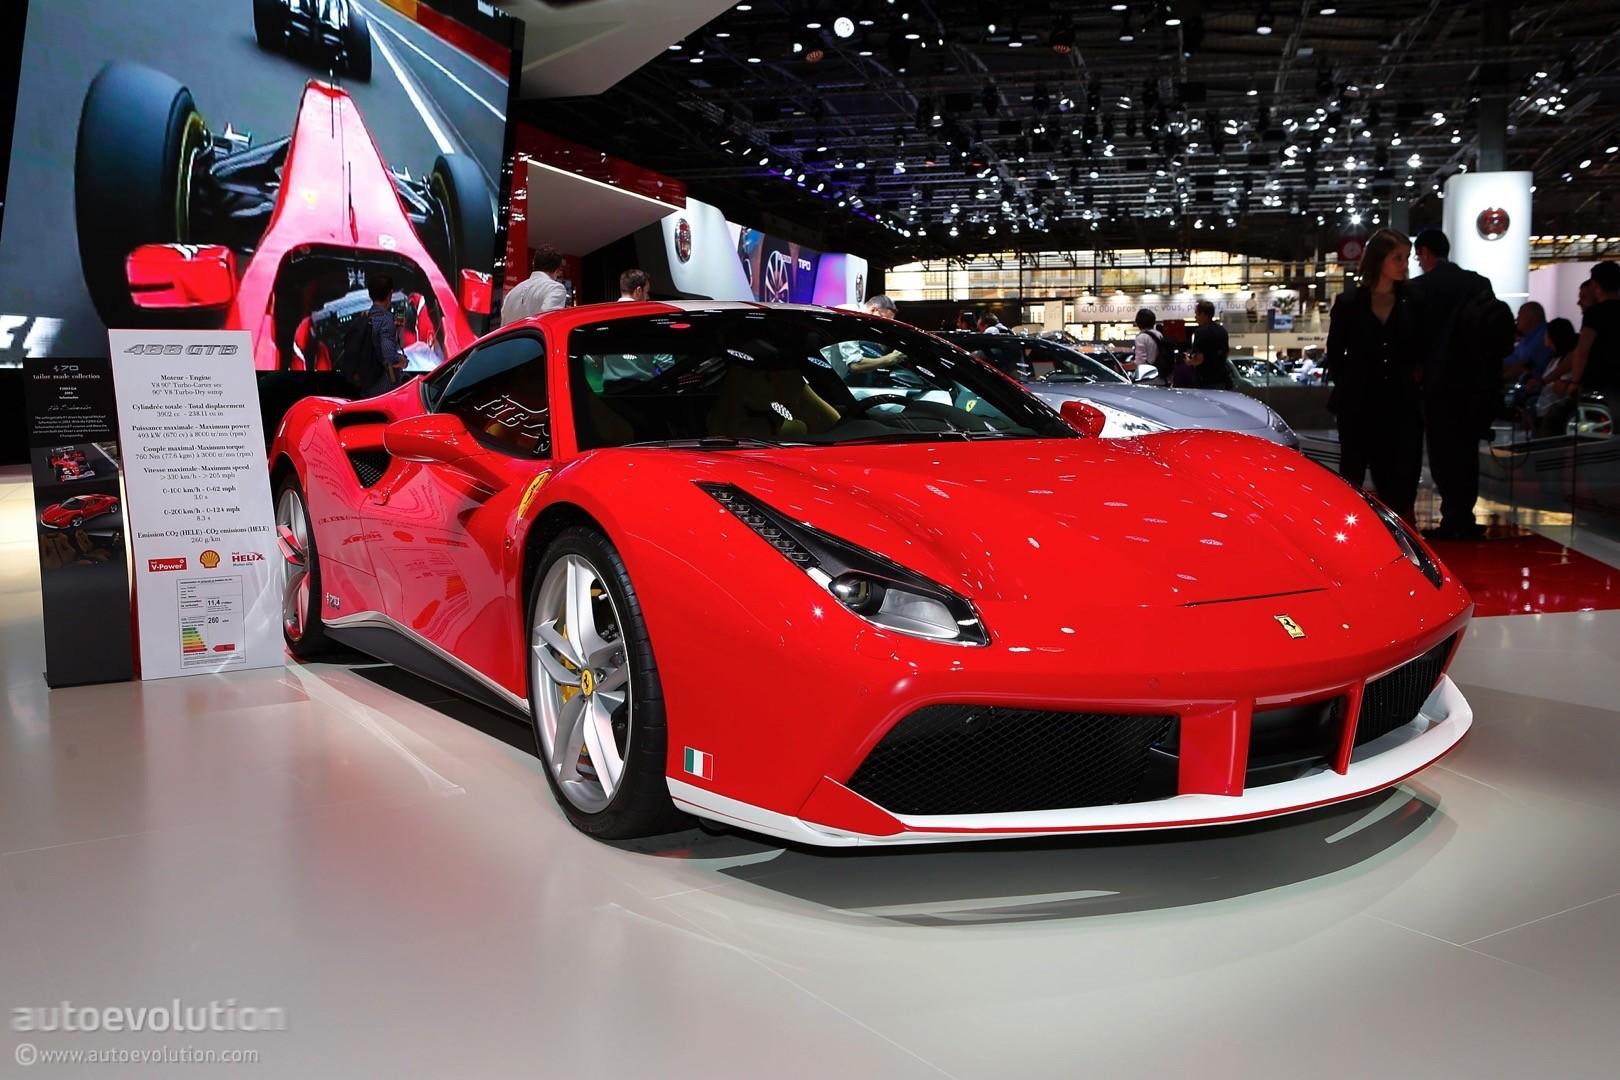 Ferrari F40 For Sale >> Ferrari Celebrates 70th Anniversary In Paris With Special ...